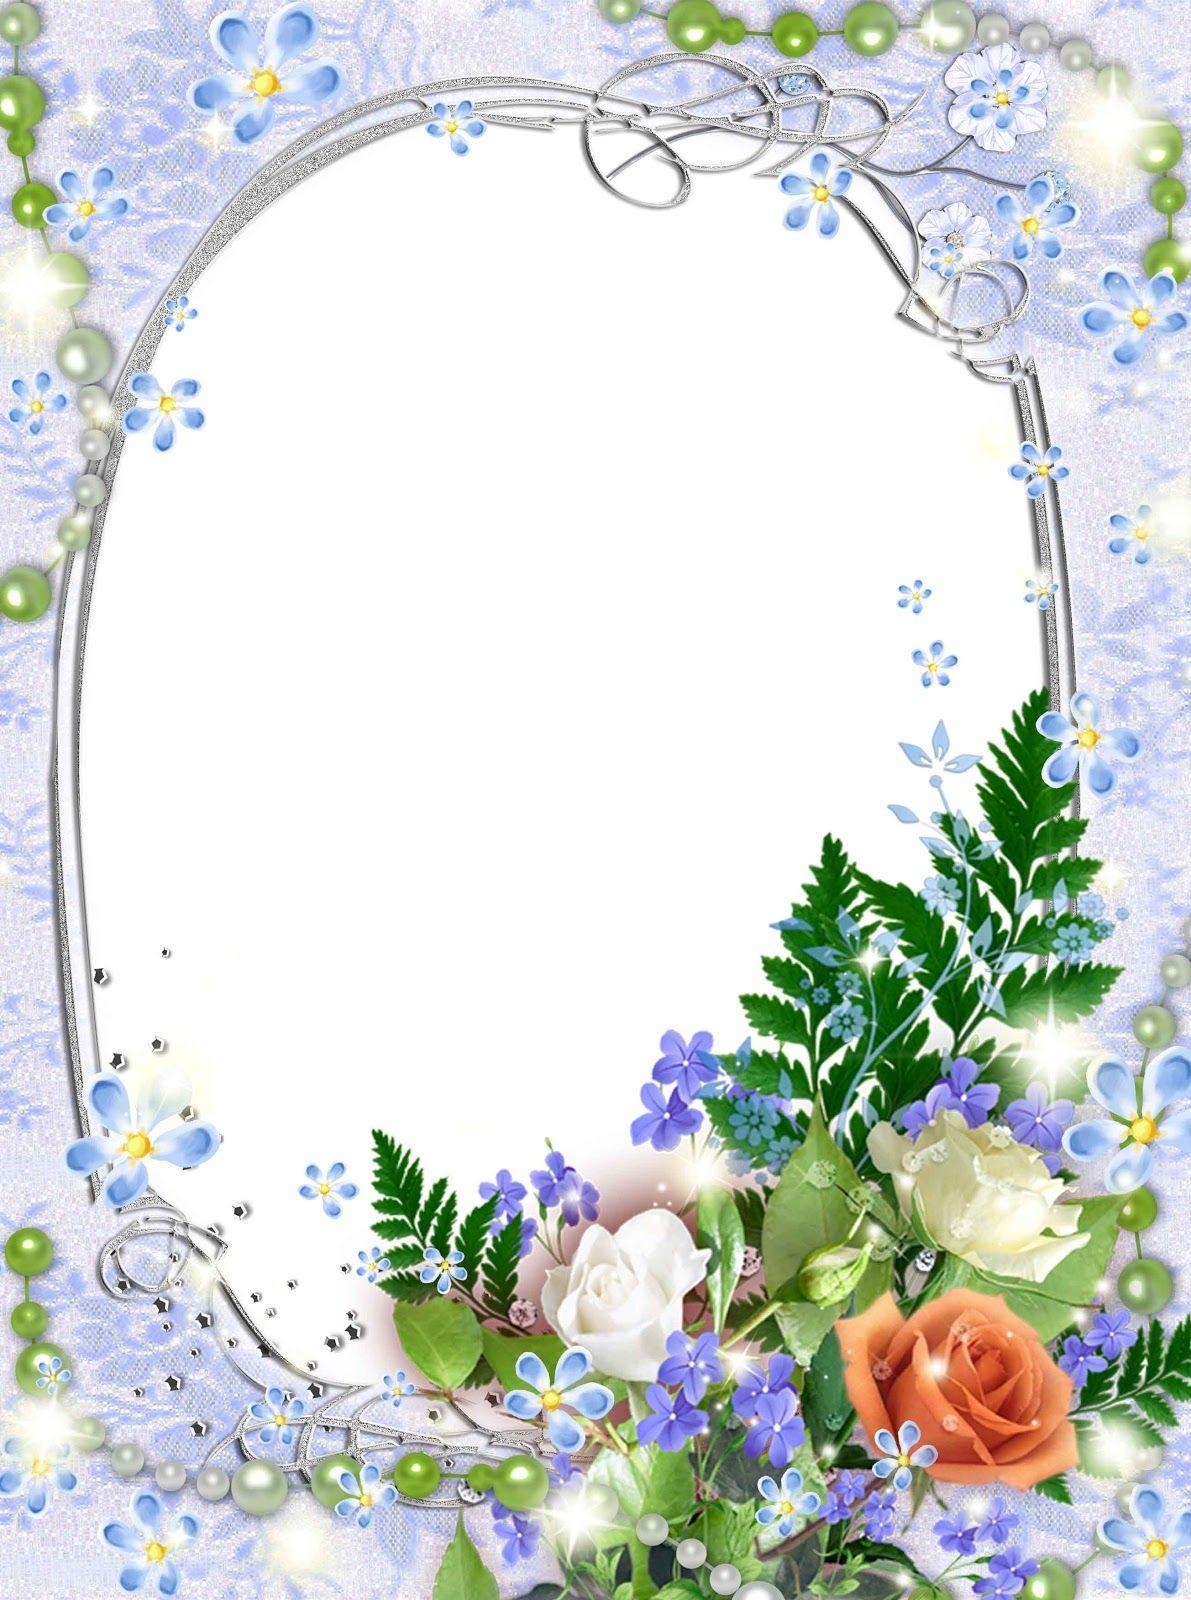 flowerphotoframespsdfreedownload3 Flower frame